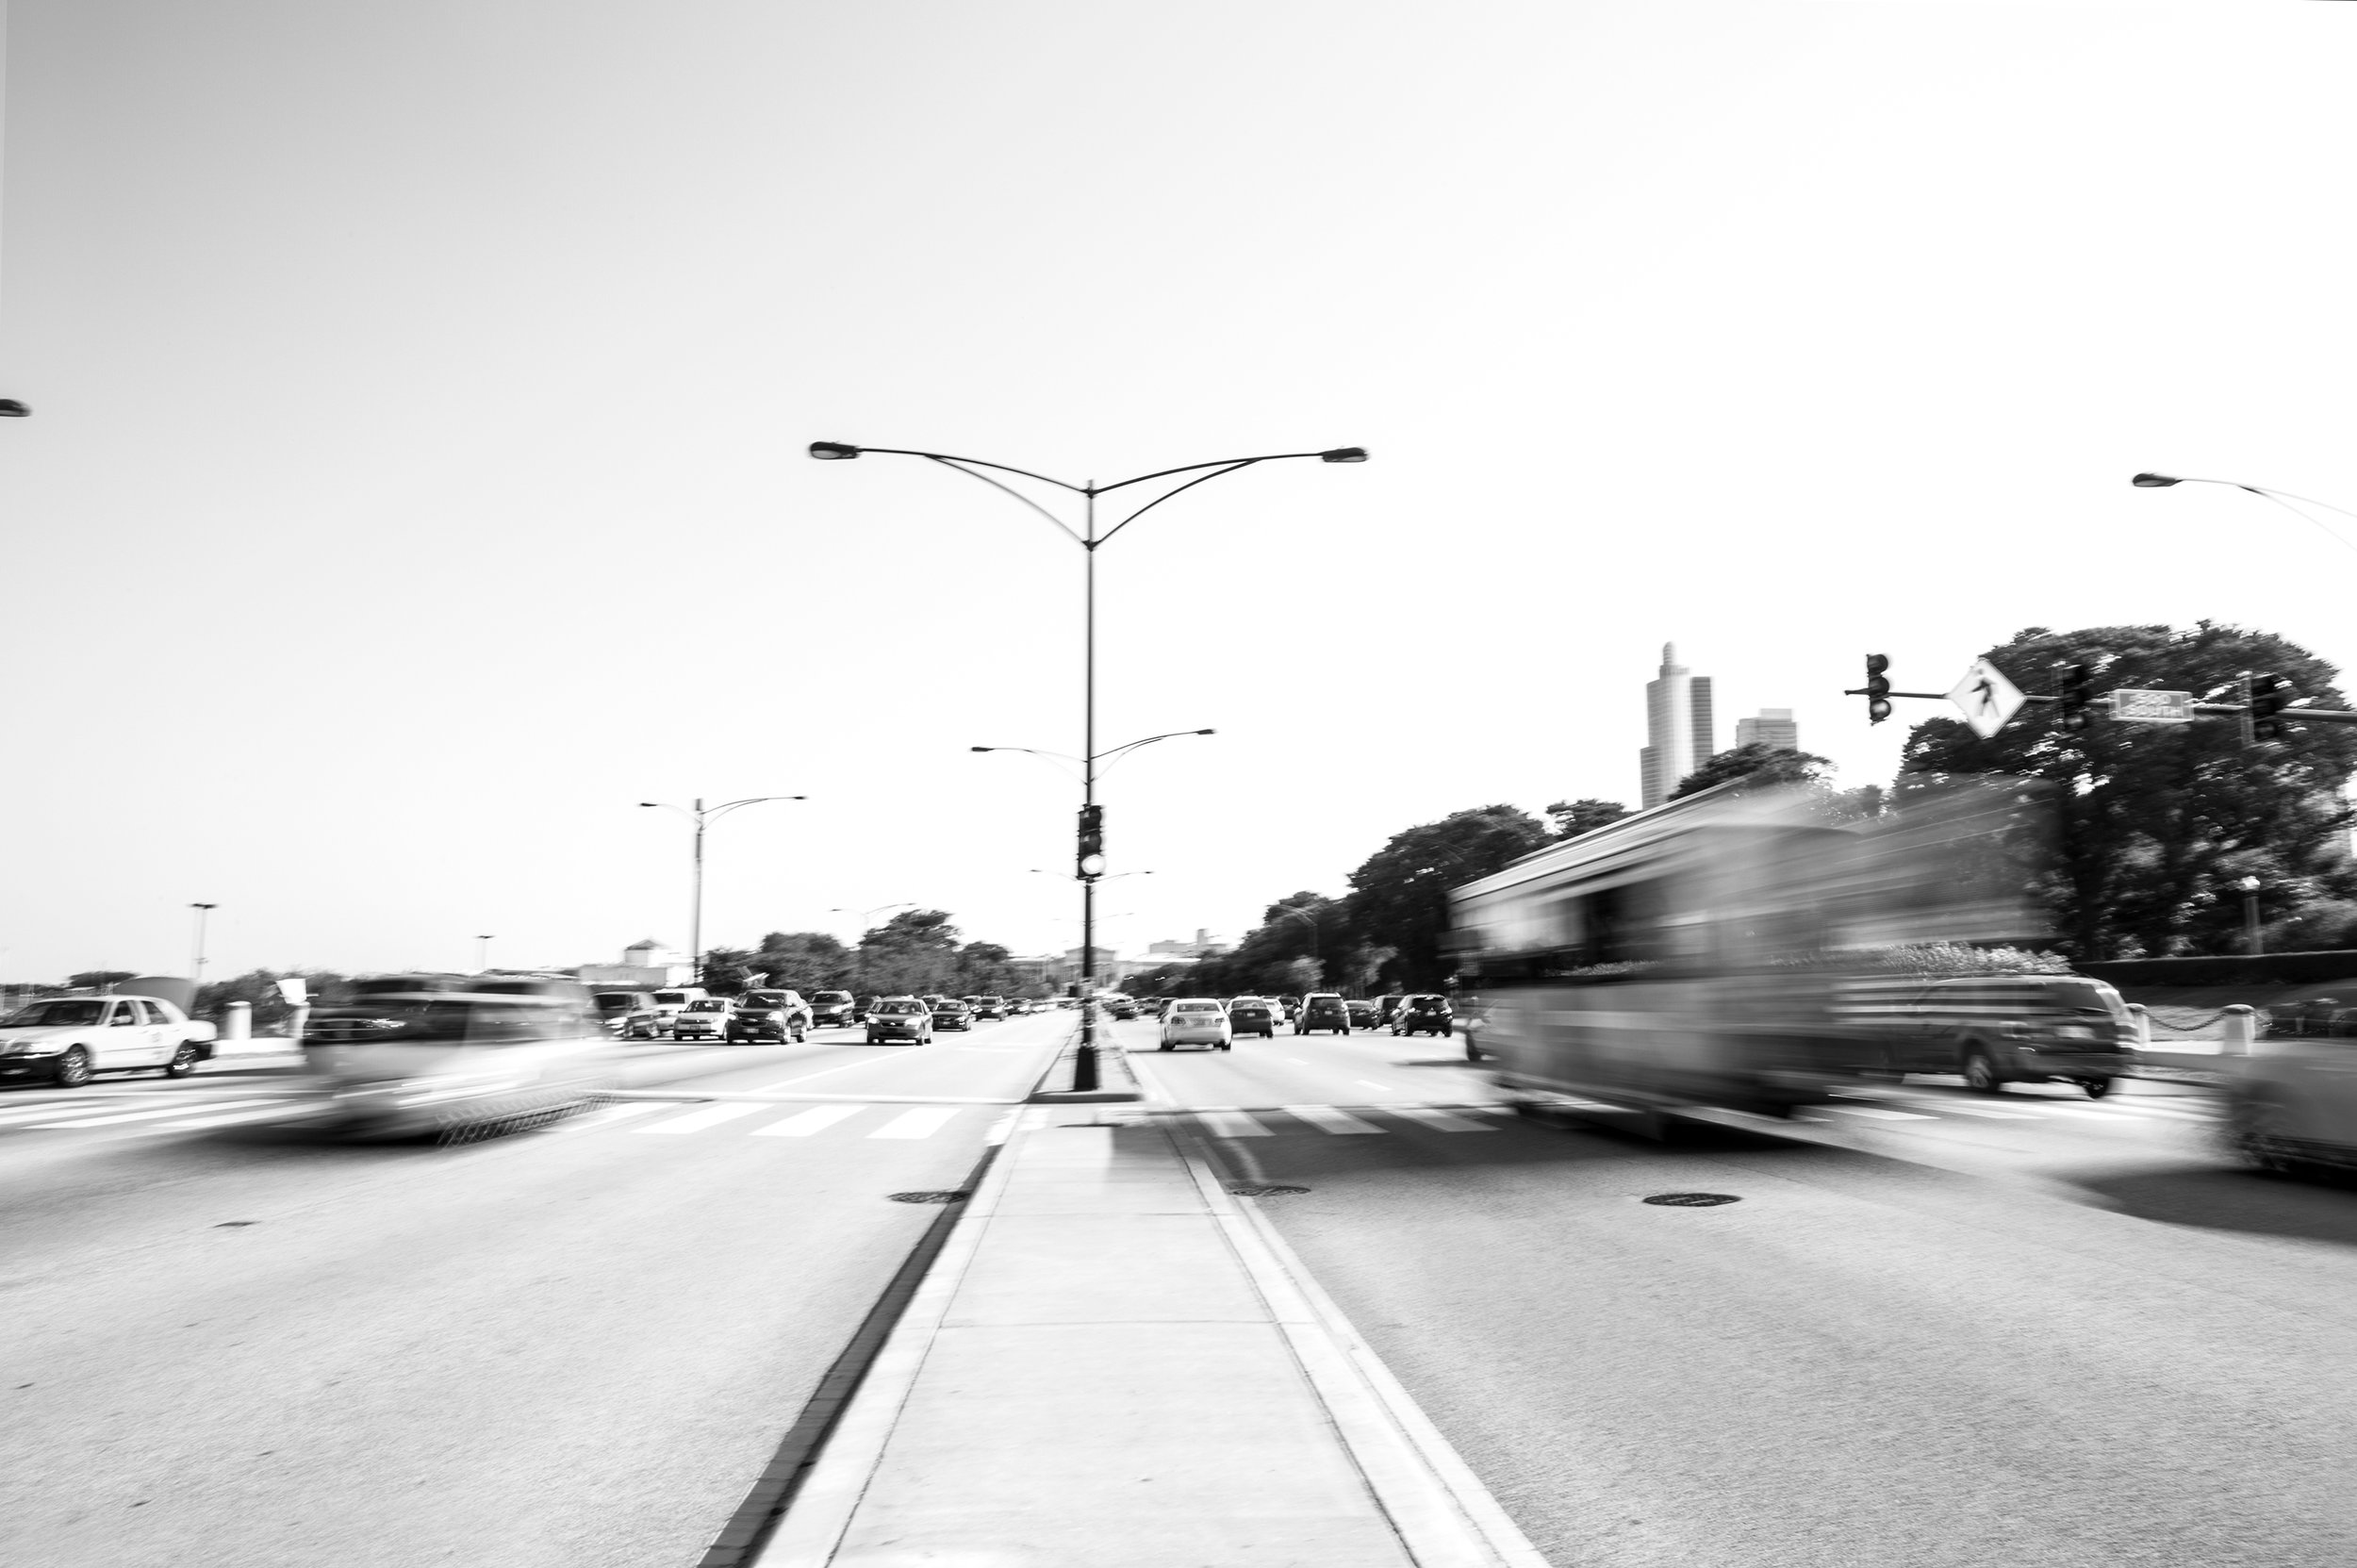 movingcars_chicago_w.jpg